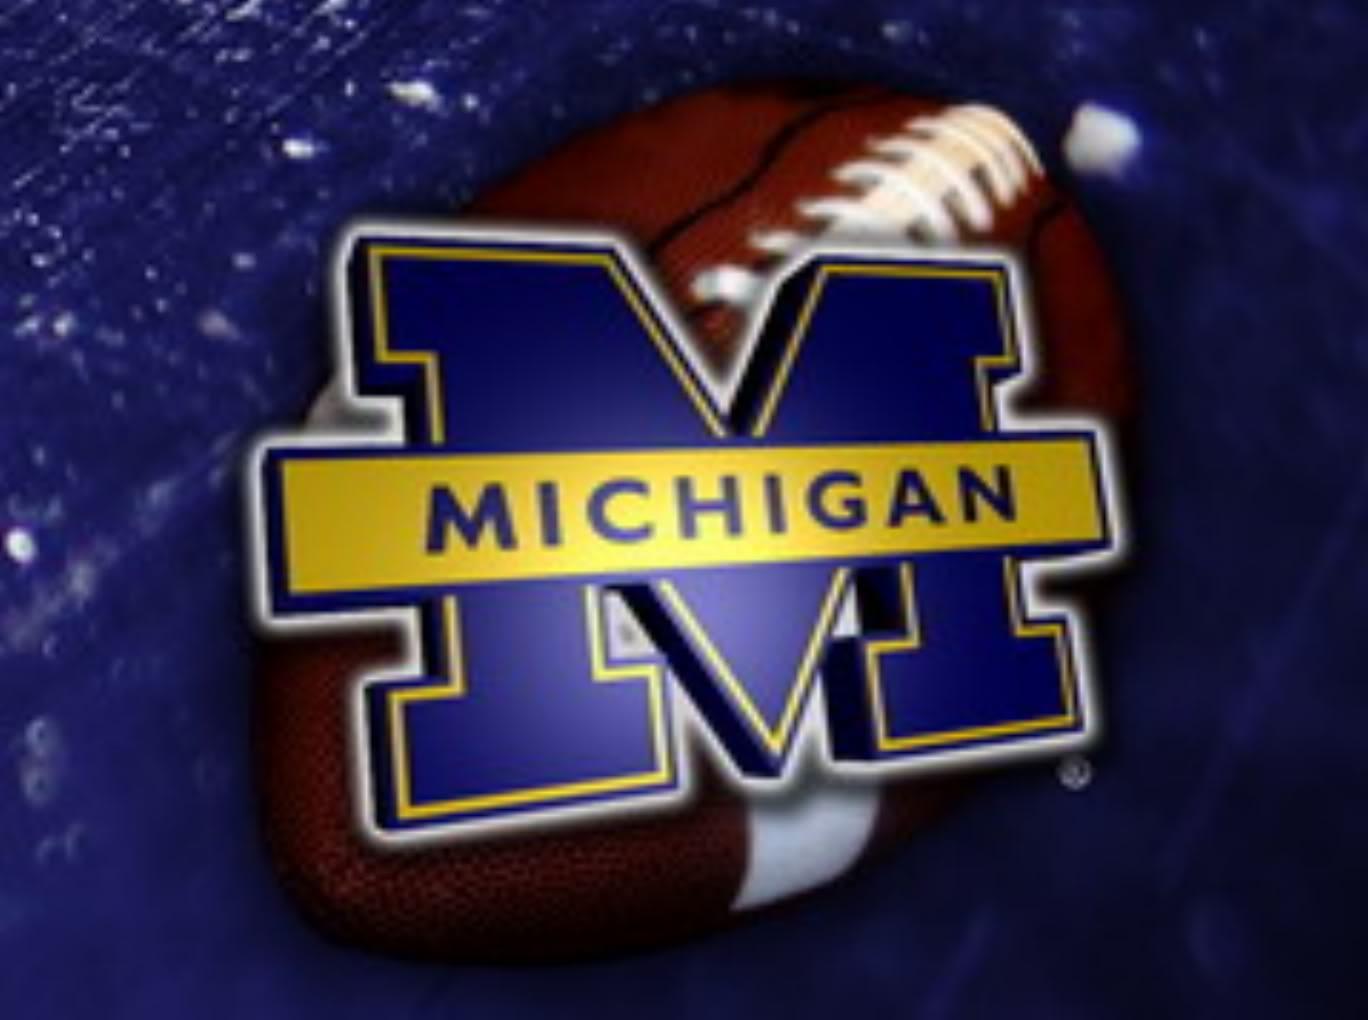 Michigan Football Wallpaper Michigan